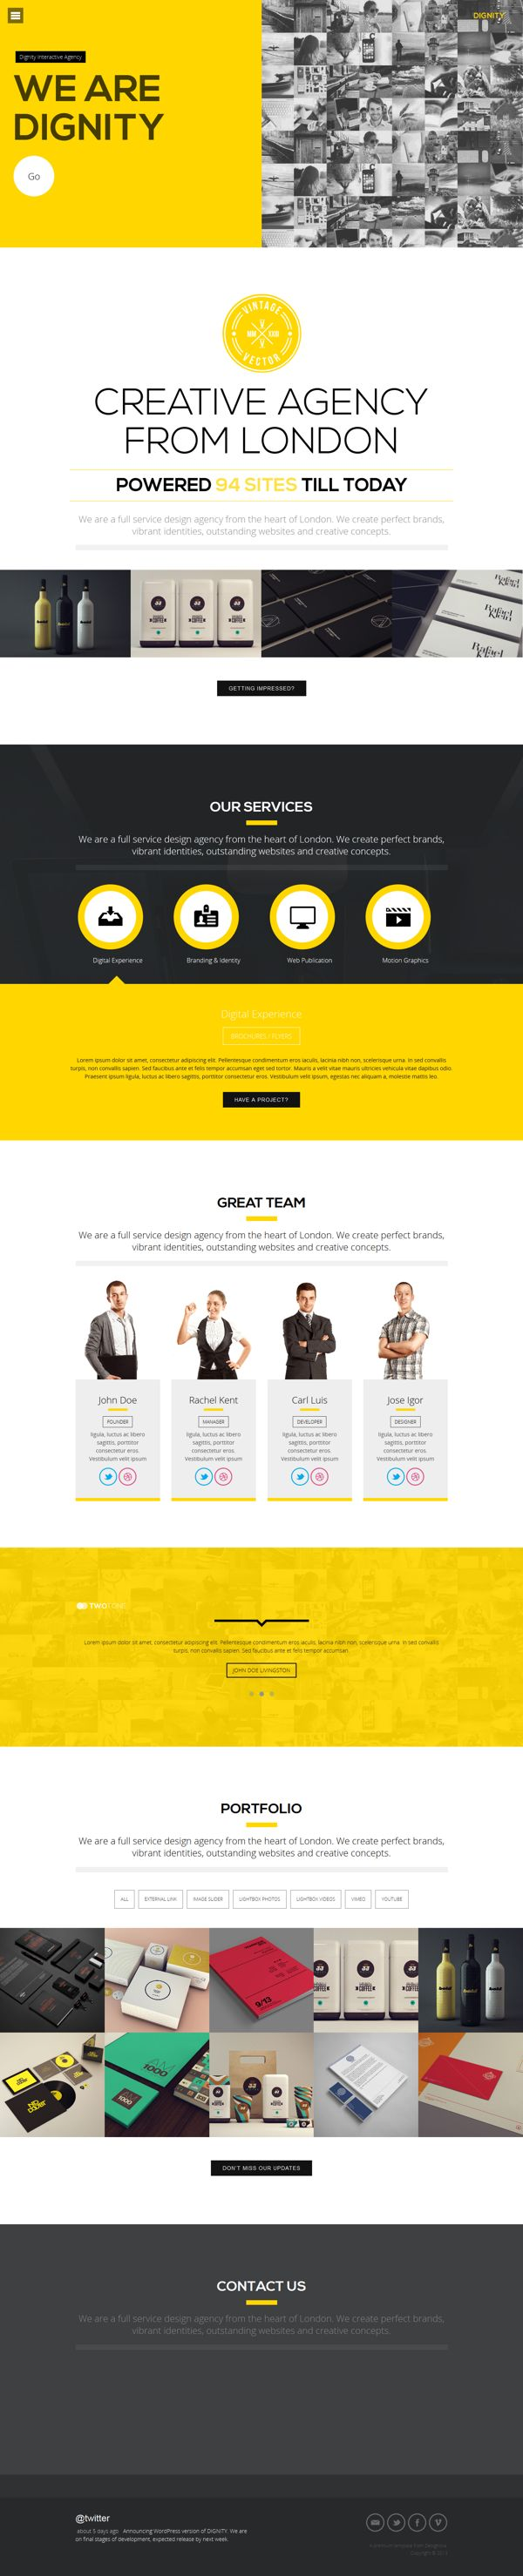 DIGNITY - WordPress One Page Responsive Portfolio by mona lisa, via Behance